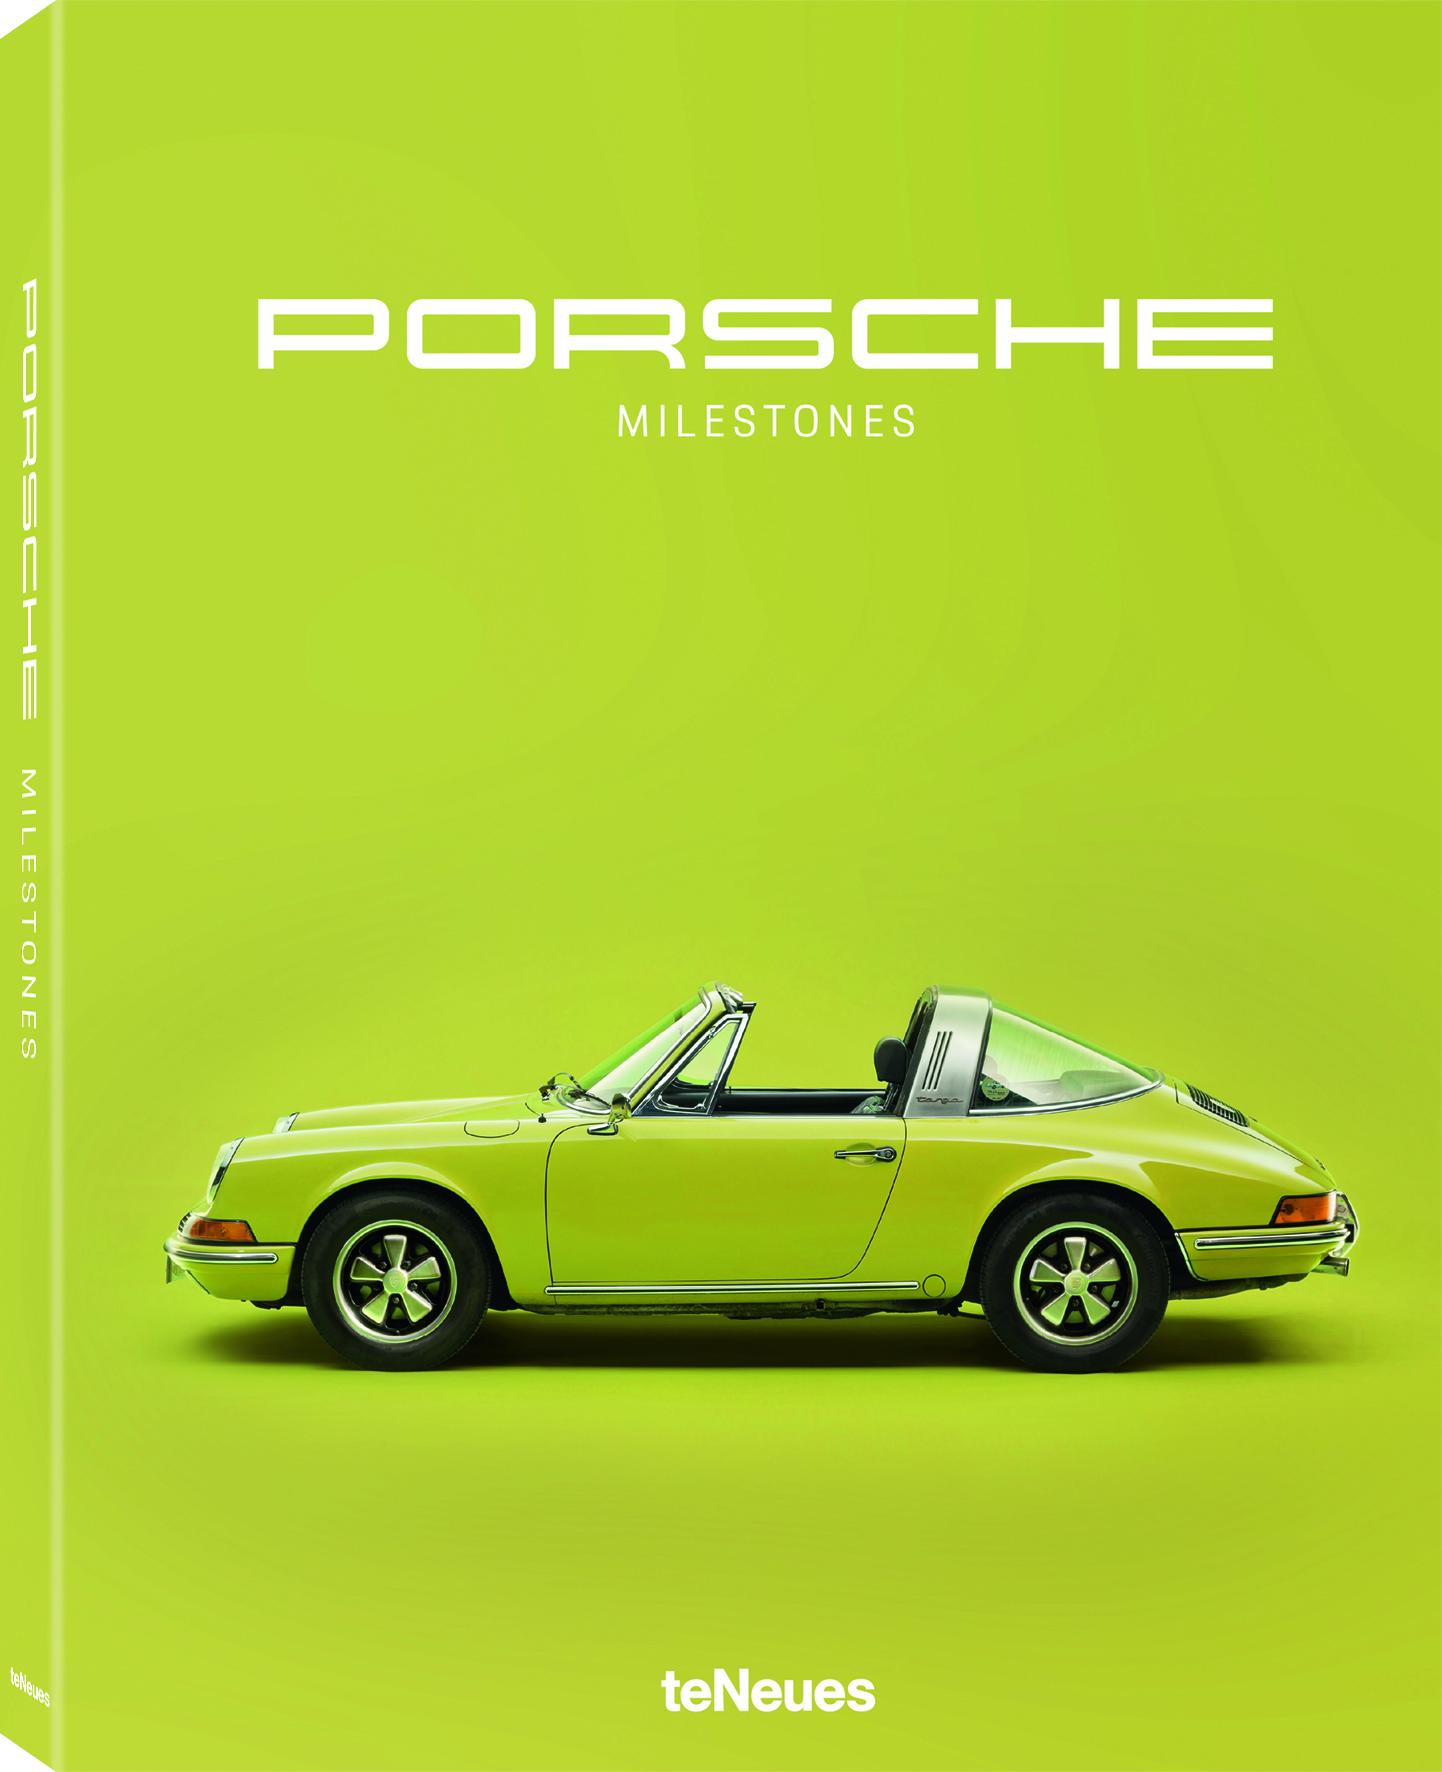 © Porsche Milestones, published by teNeues, € 49,90 www.teneues.com. Porsche 911 T Targa, 1970, Photo © Rafael Krötz